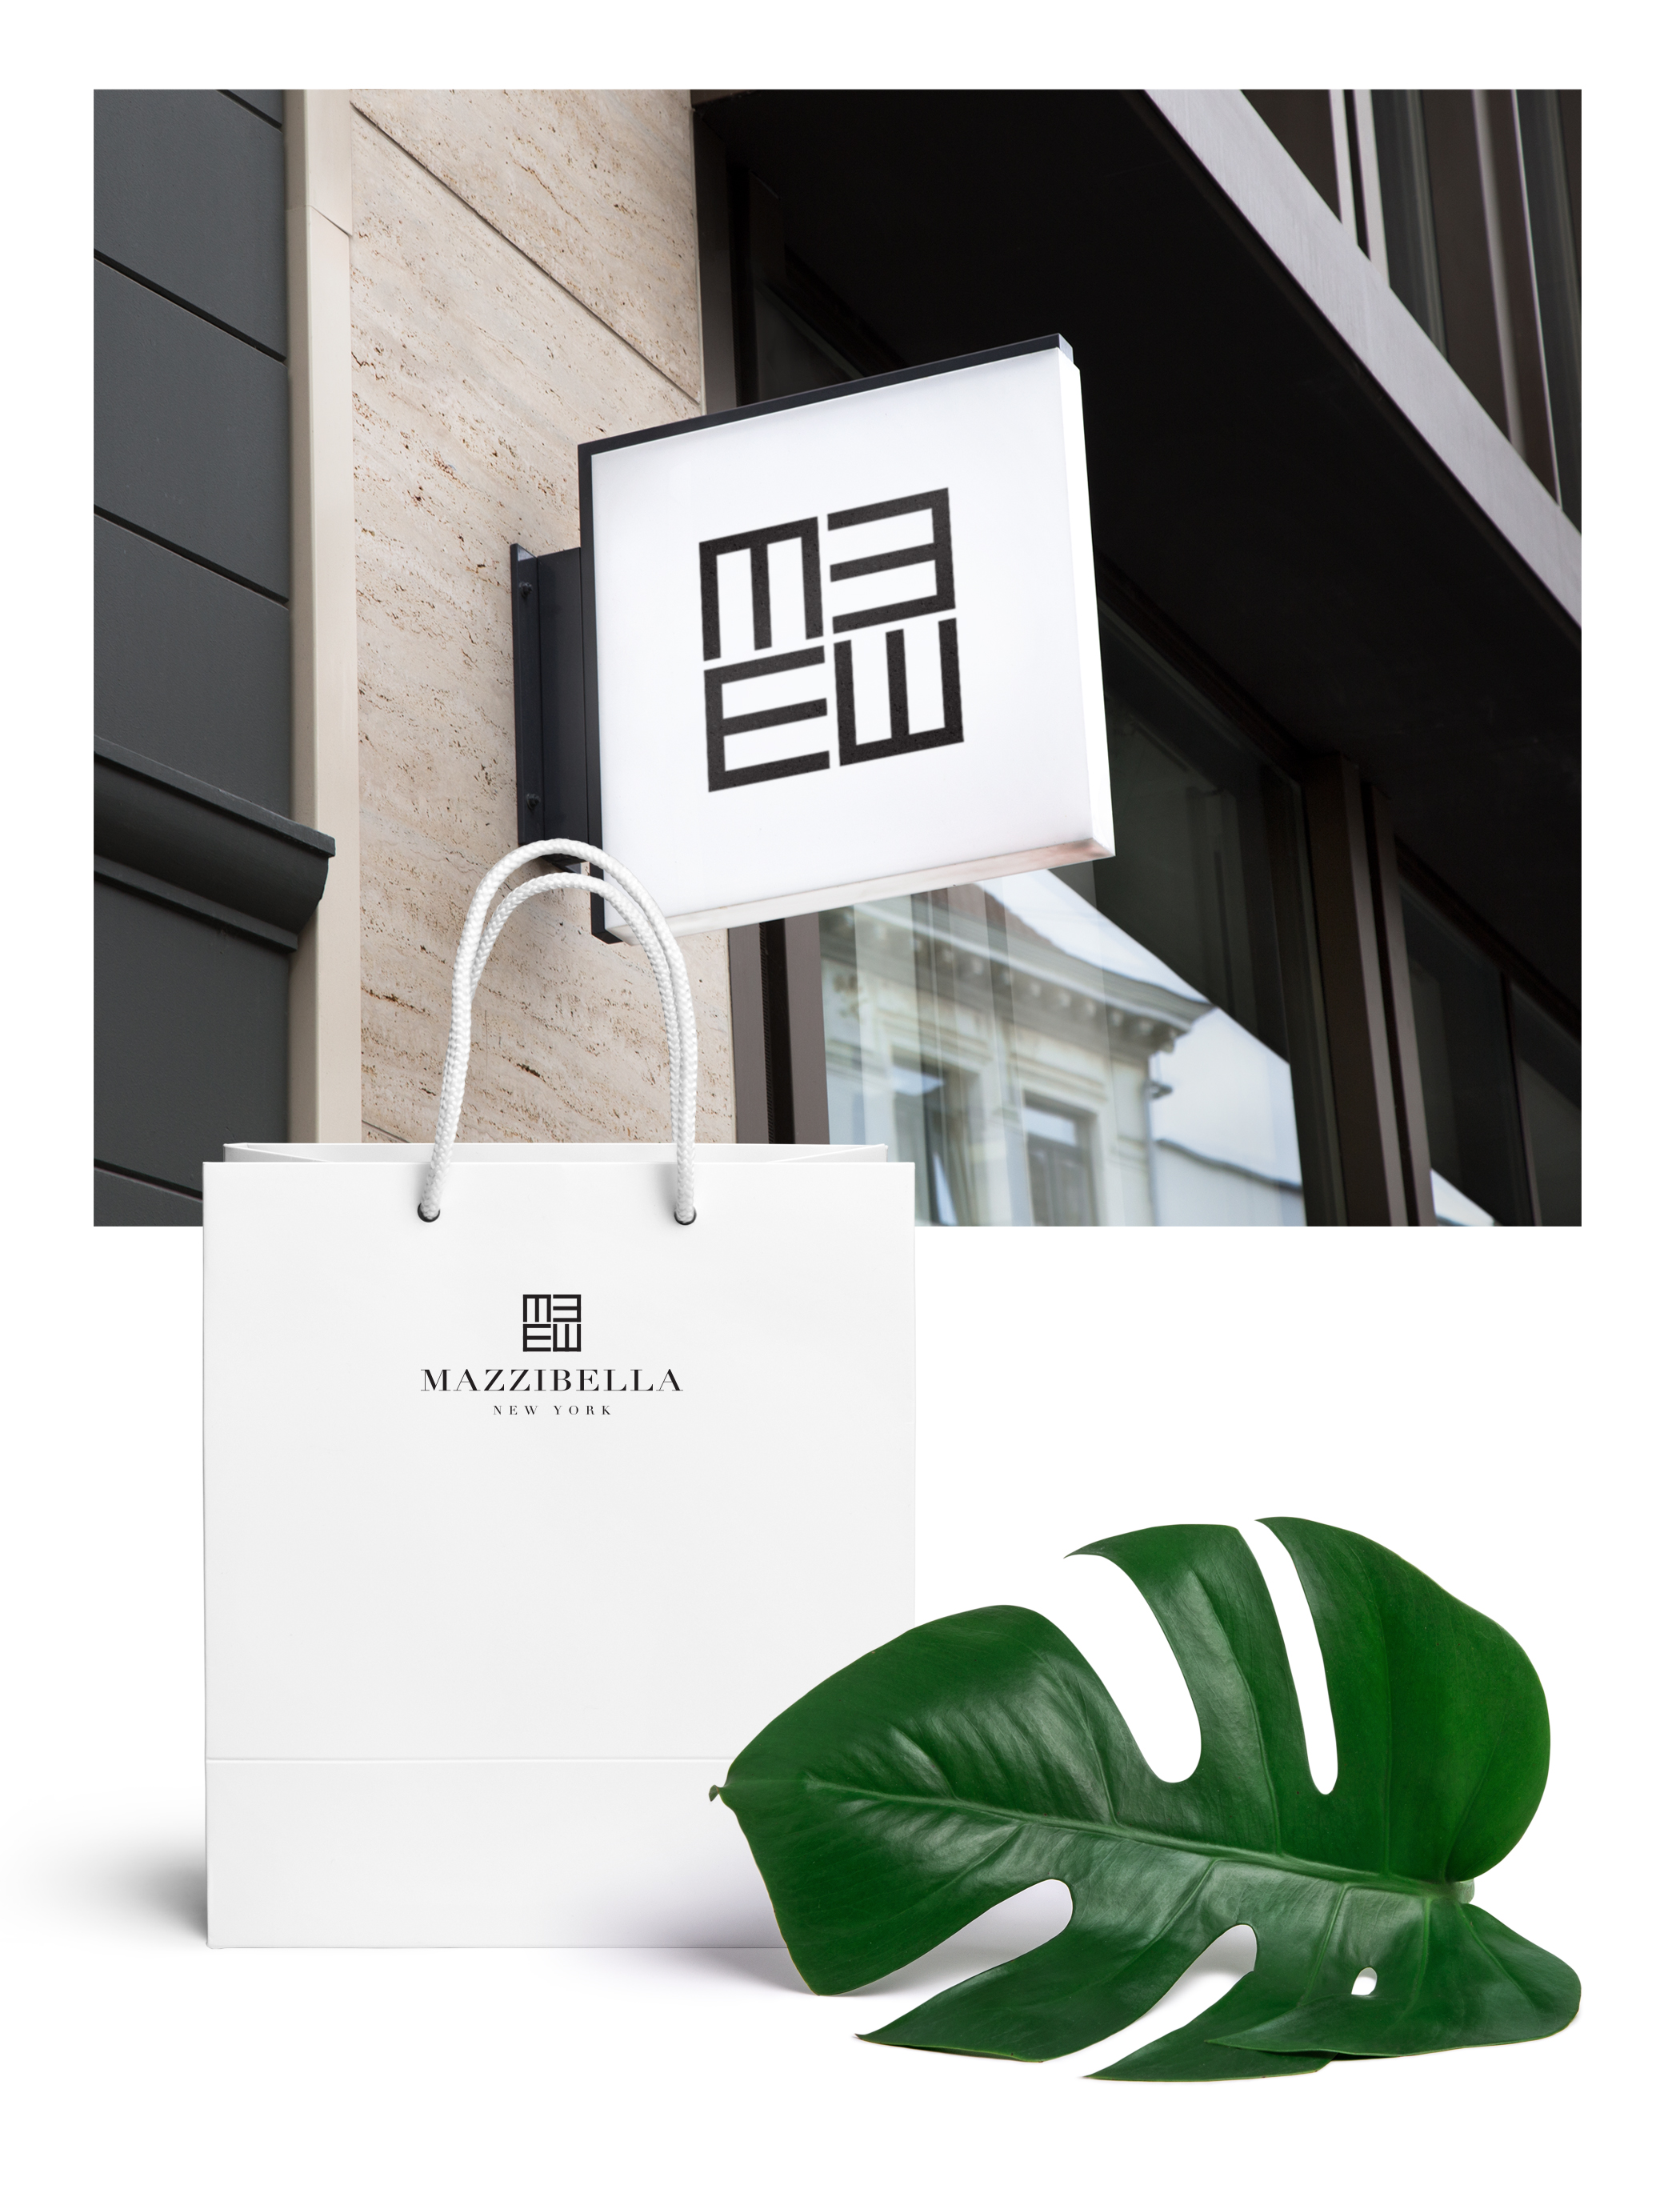 Mazzibella Sign and Bag.jpg